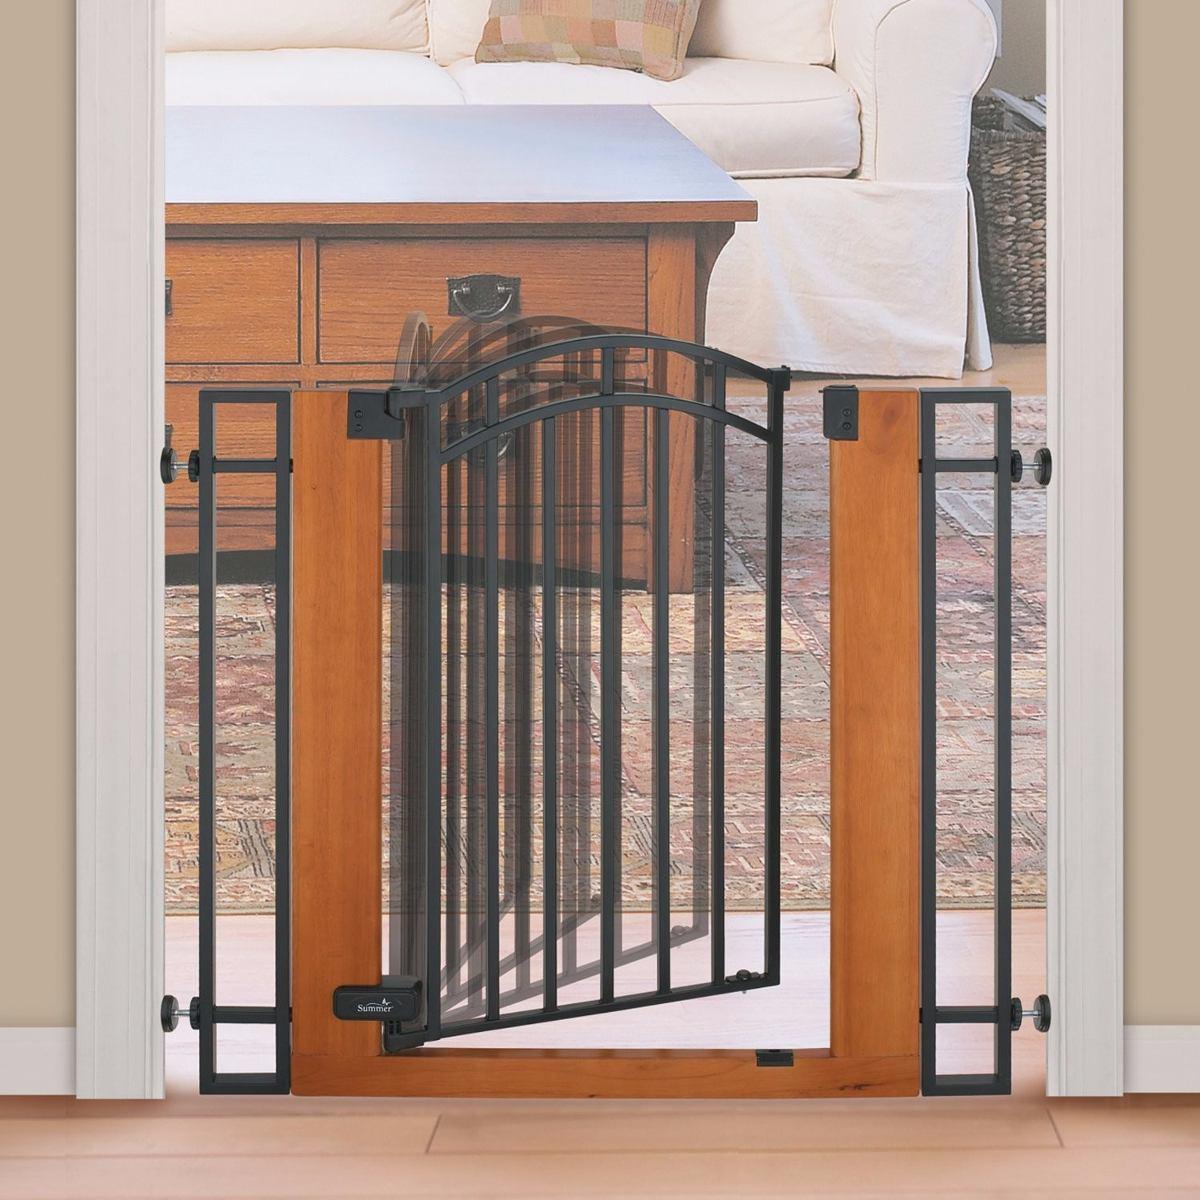 Puerta reja de seguridad madera y metal summer infant - Puertas de reja ...